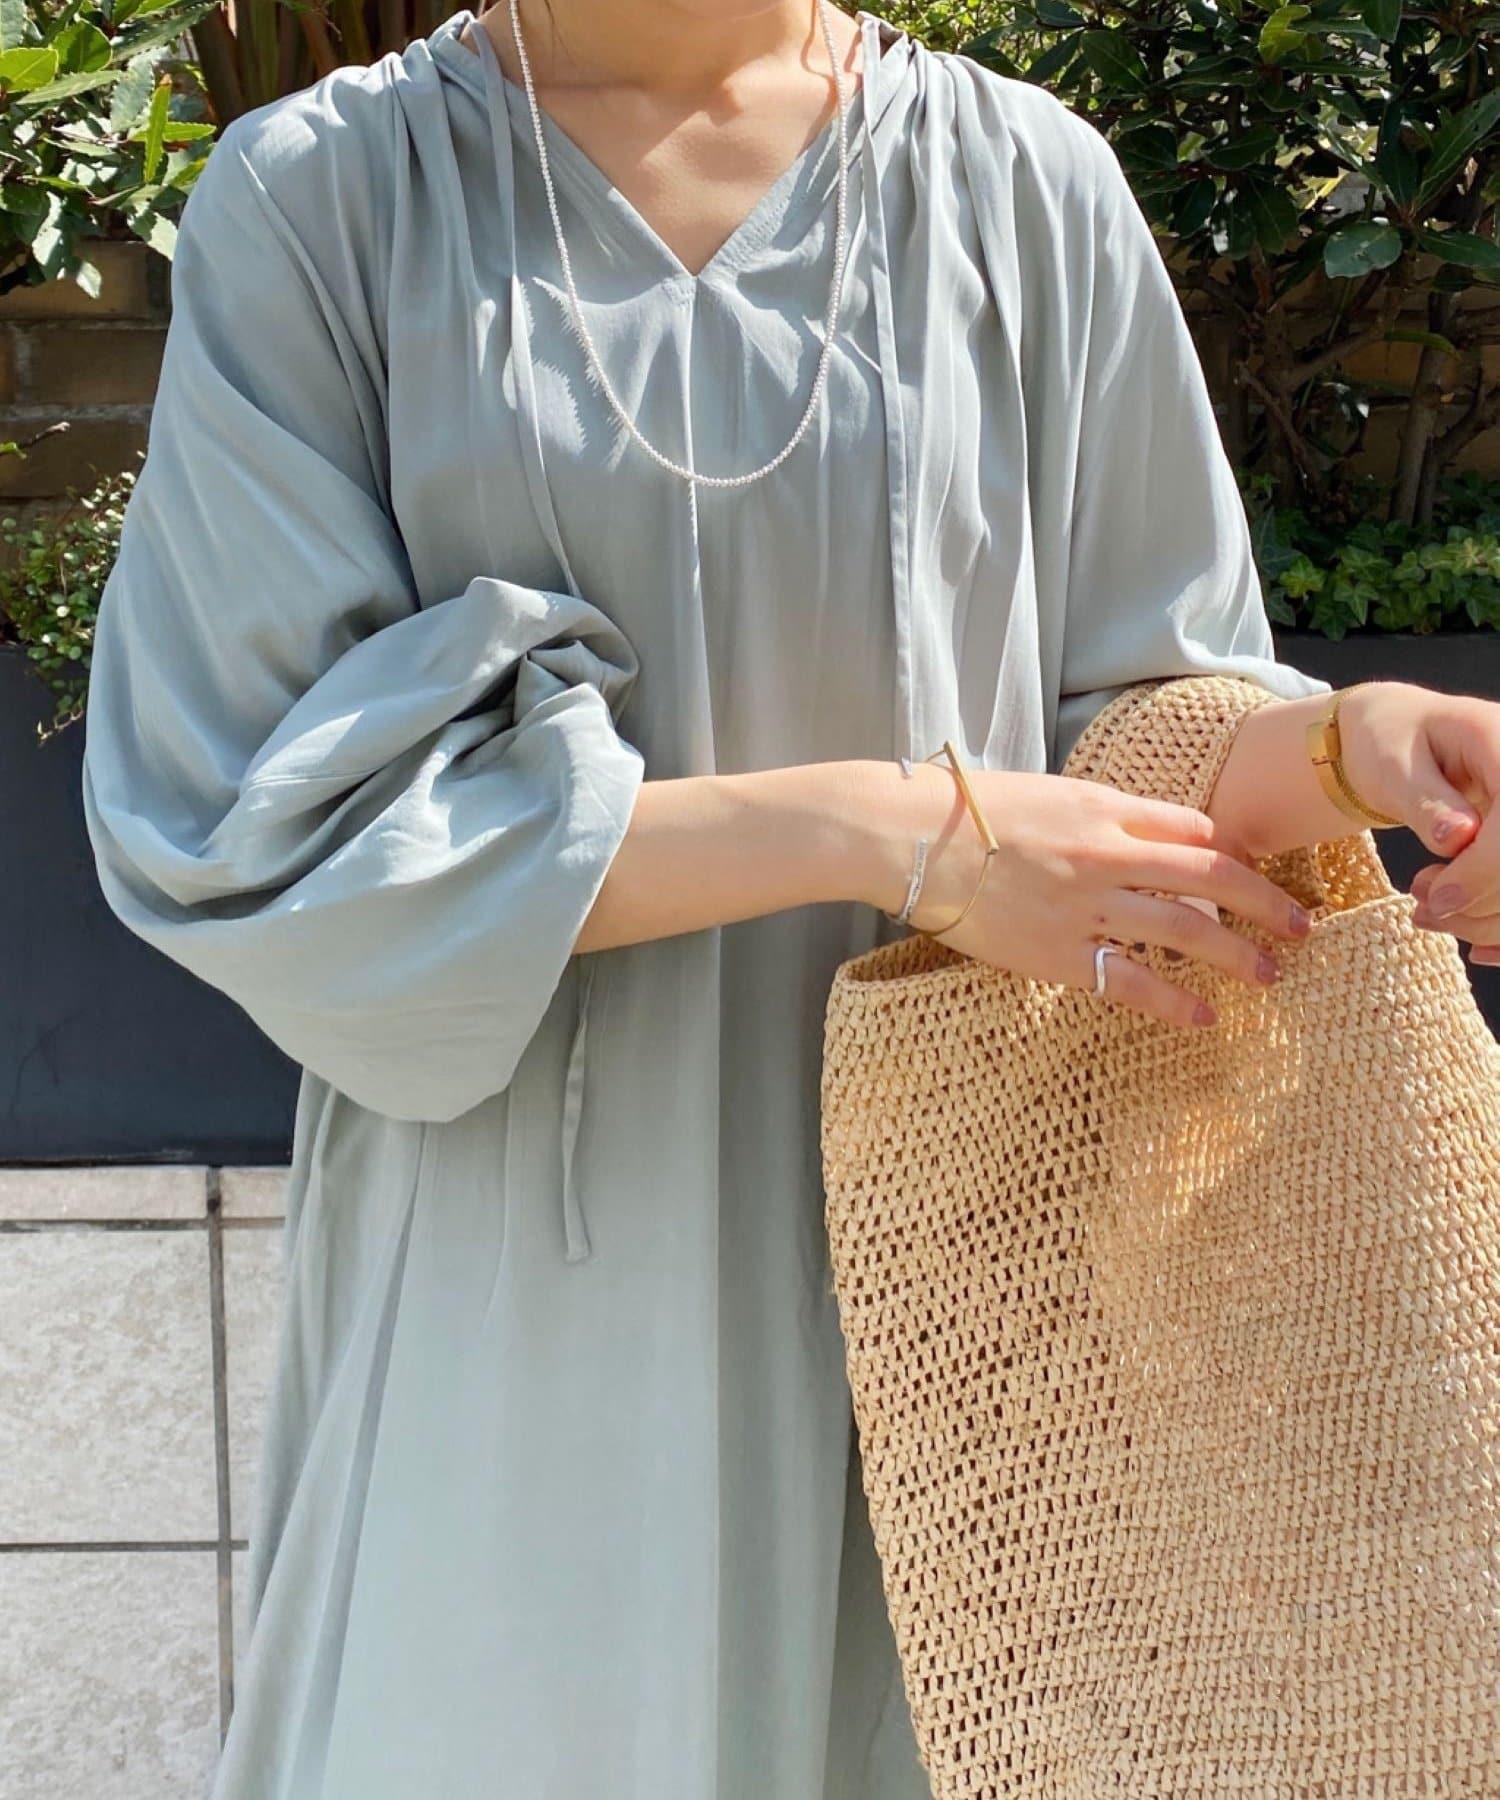 SHENERY(シーナリー) 袖ボリュームワンピース